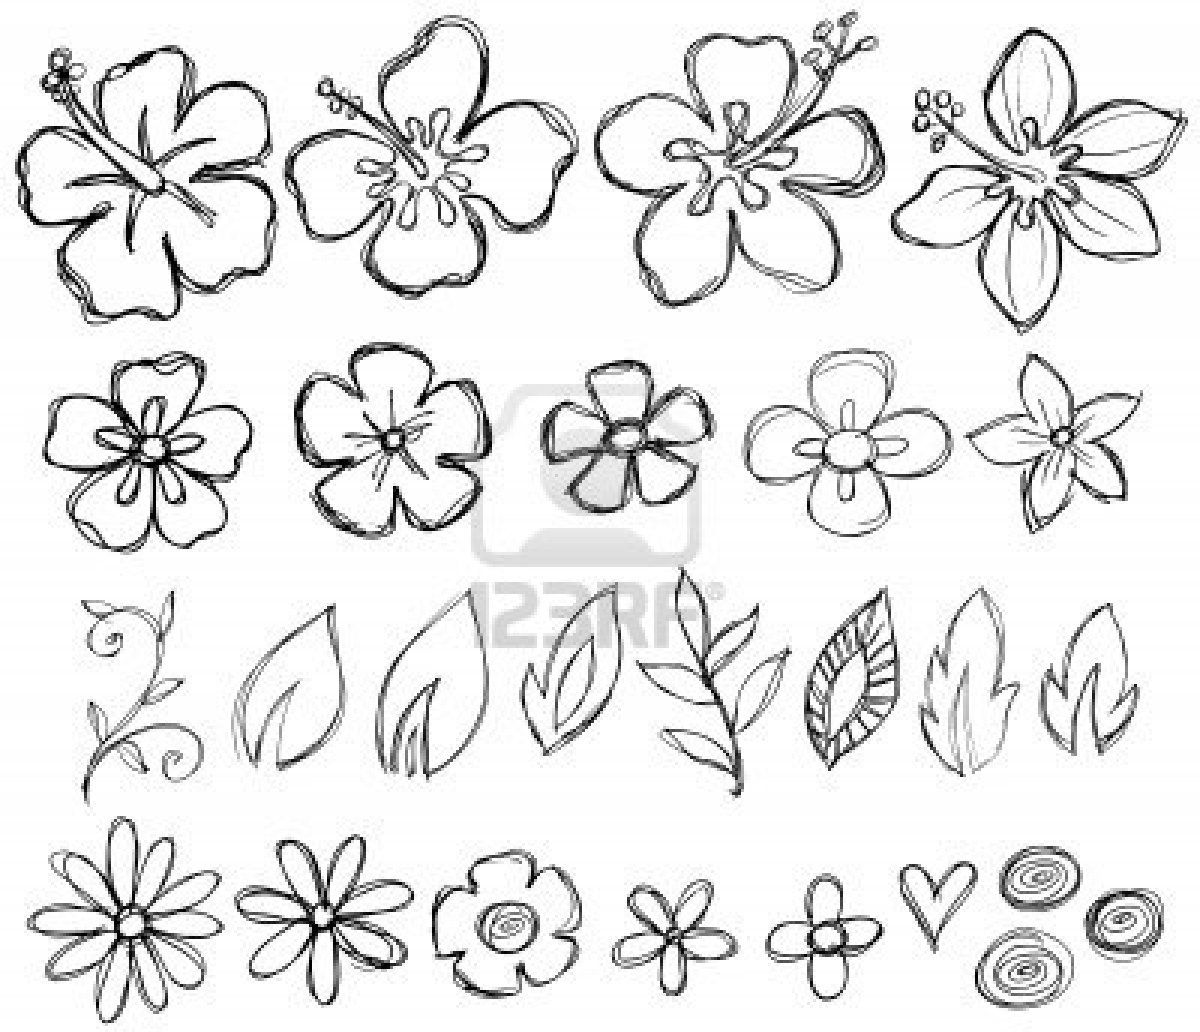 Sketcy doodle tropical vector elements in 2018 drawing pinterest sketcy doodle tropical vector elements stock photo flower sketches doodle drawings doodle art izmirmasajfo